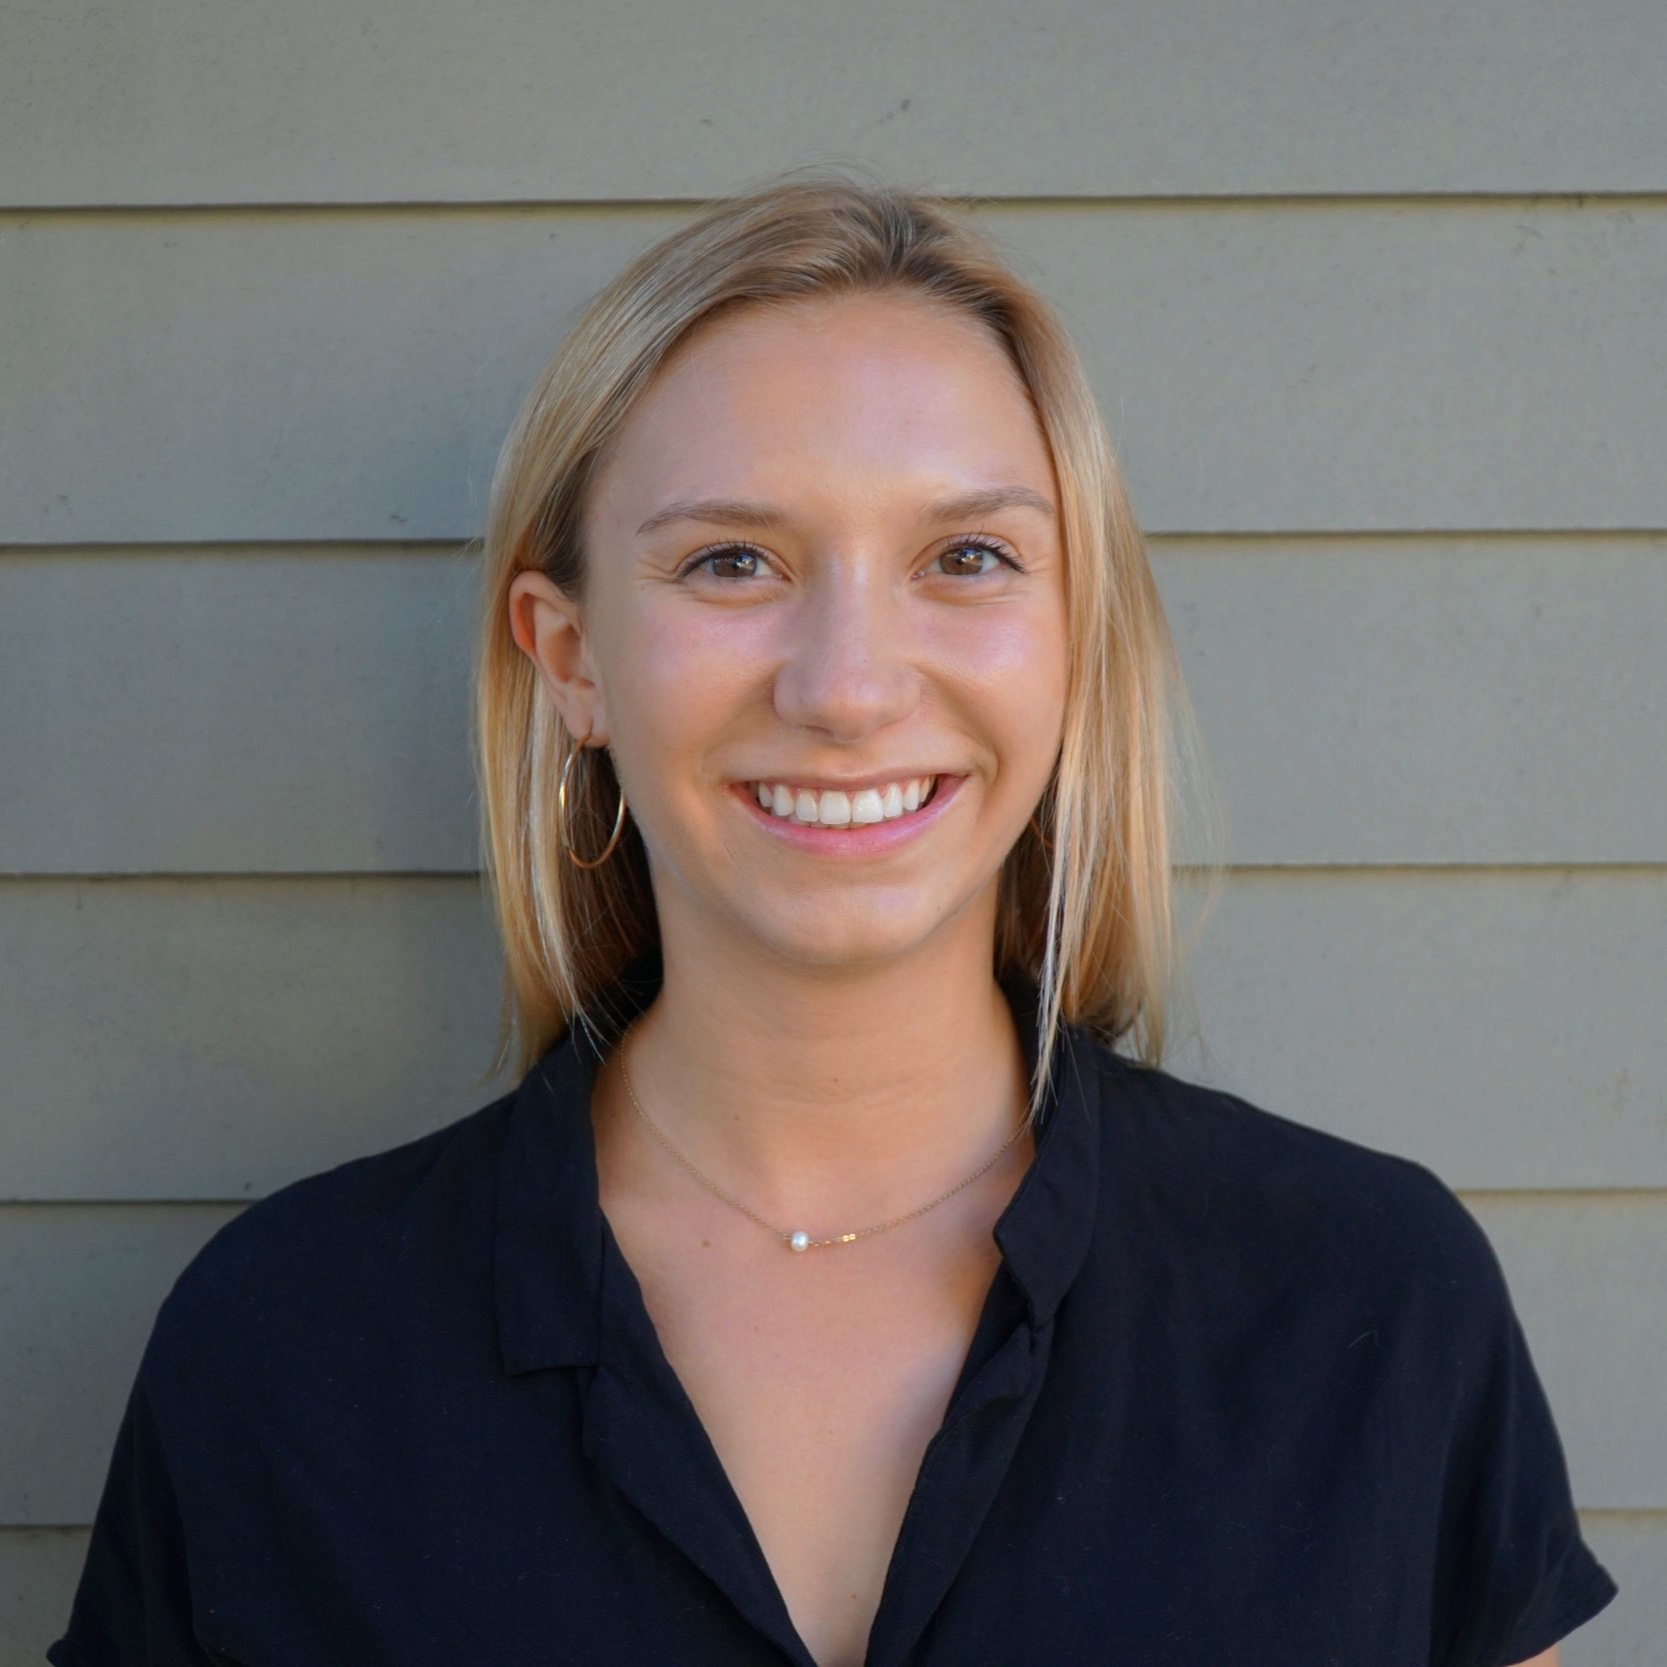 Olivia Belman, B.A. - Family Brain Project Coordinator, UCSF